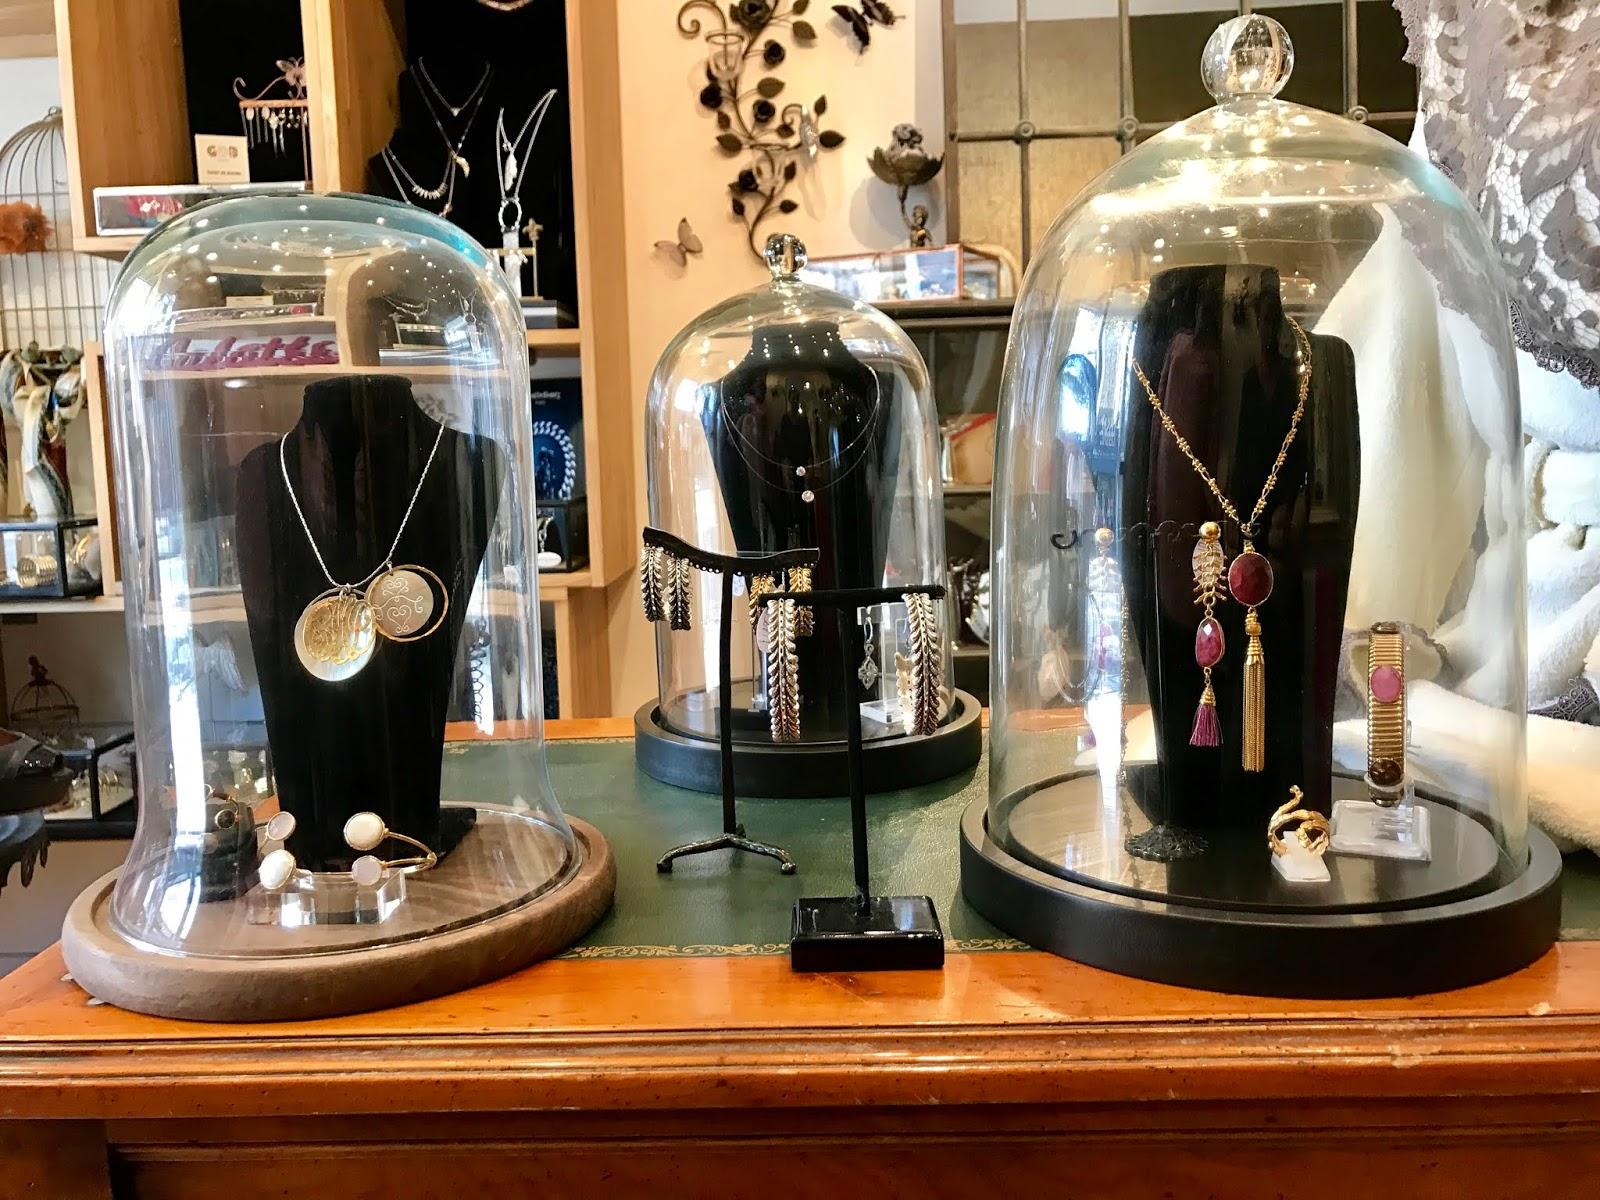 10-galatee-vente-de-bijoux-de-createurs-boulogne-billancourt